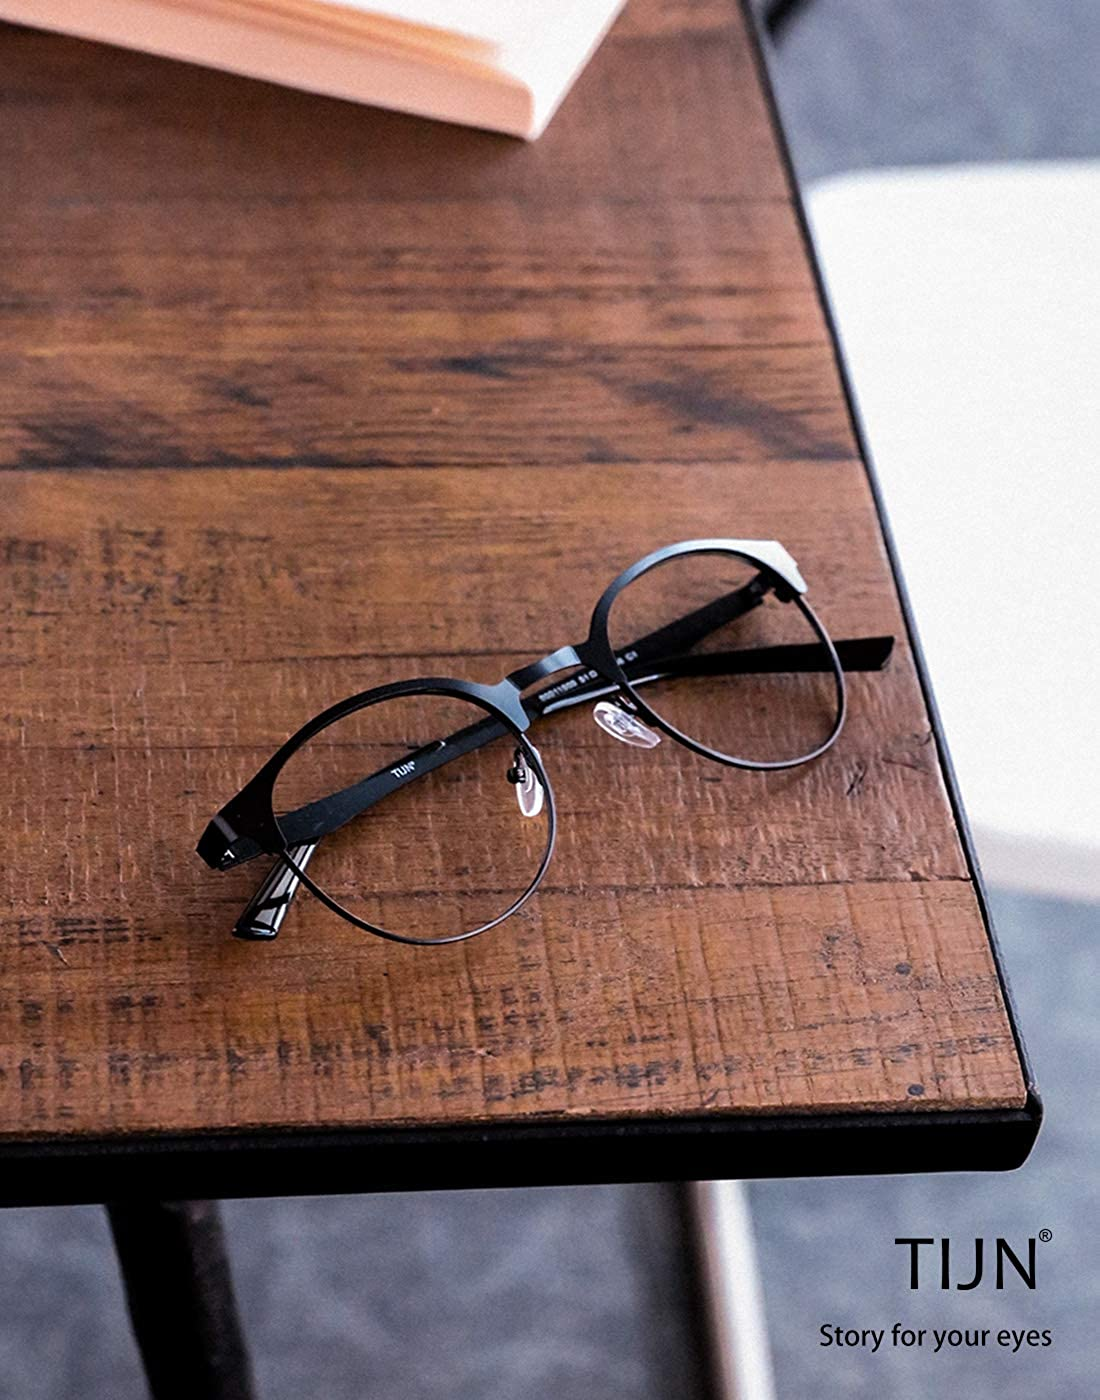 b6c697969dba Amazon.com: TIJN New Round Metal Non-Prescription Glasses Frame with Clear  Lens: Sports & Outdoors